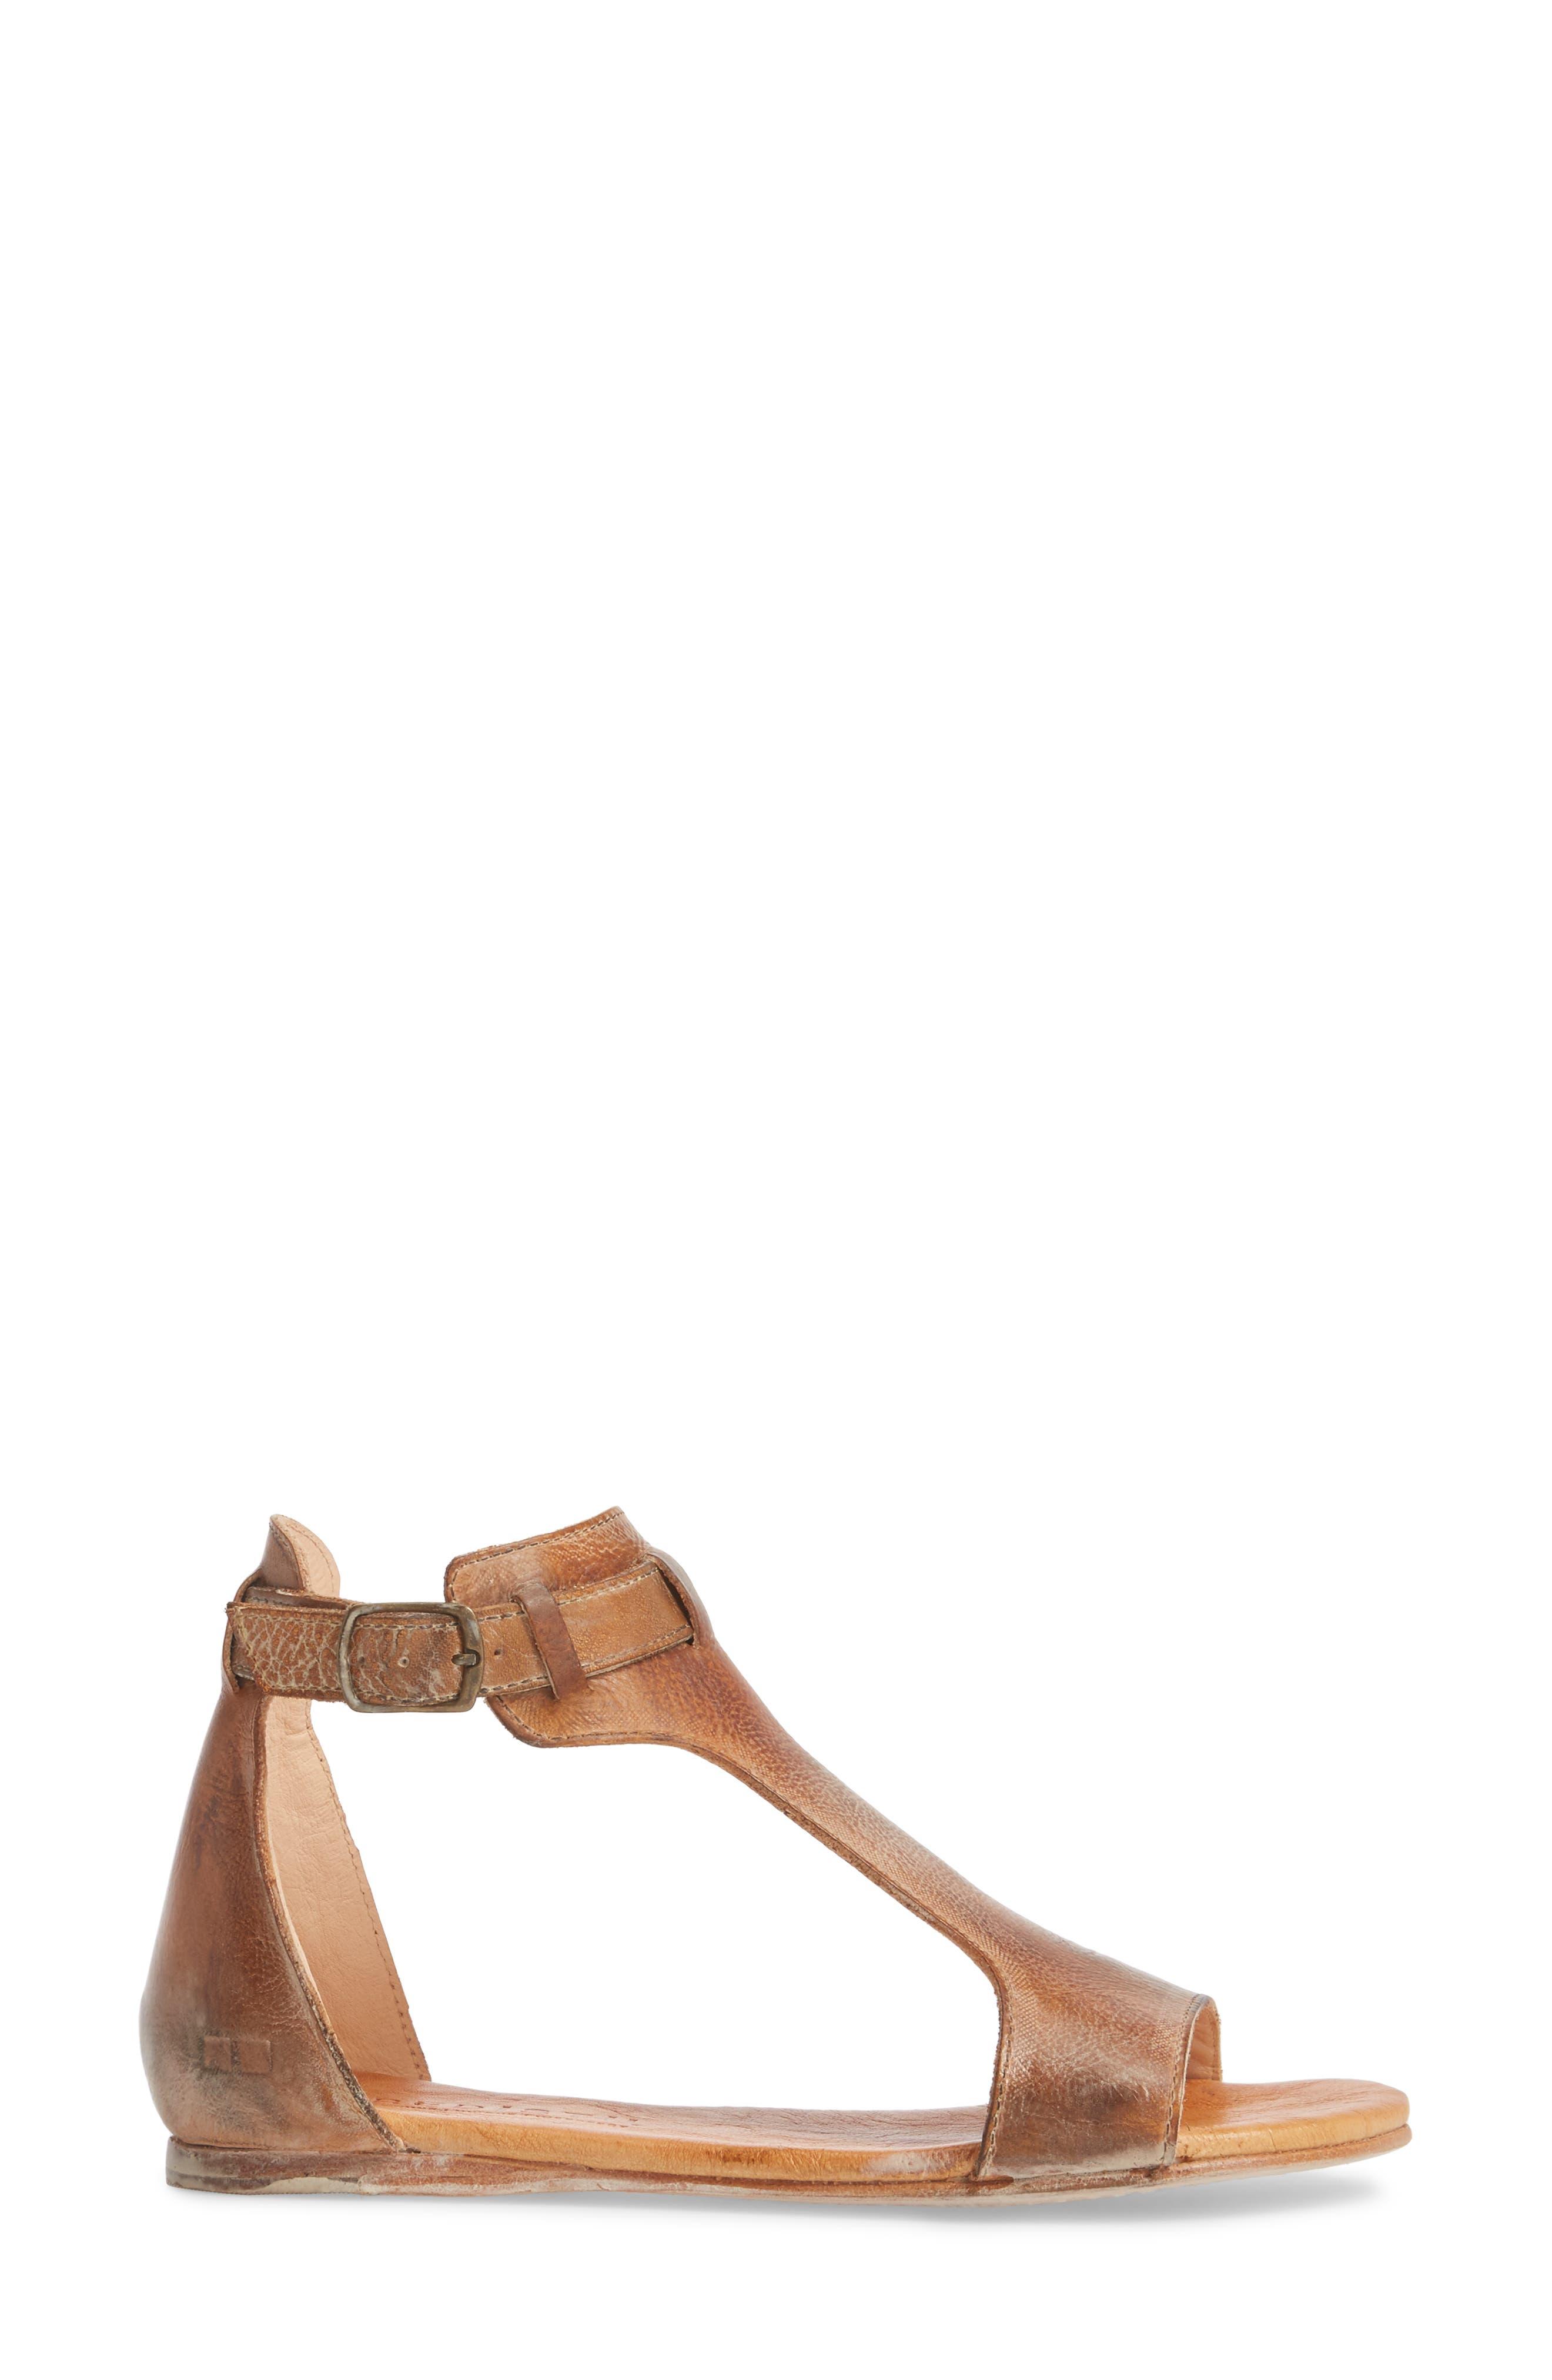 Sable Sandal,                             Alternate thumbnail 3, color,                             Tan/ White Leather